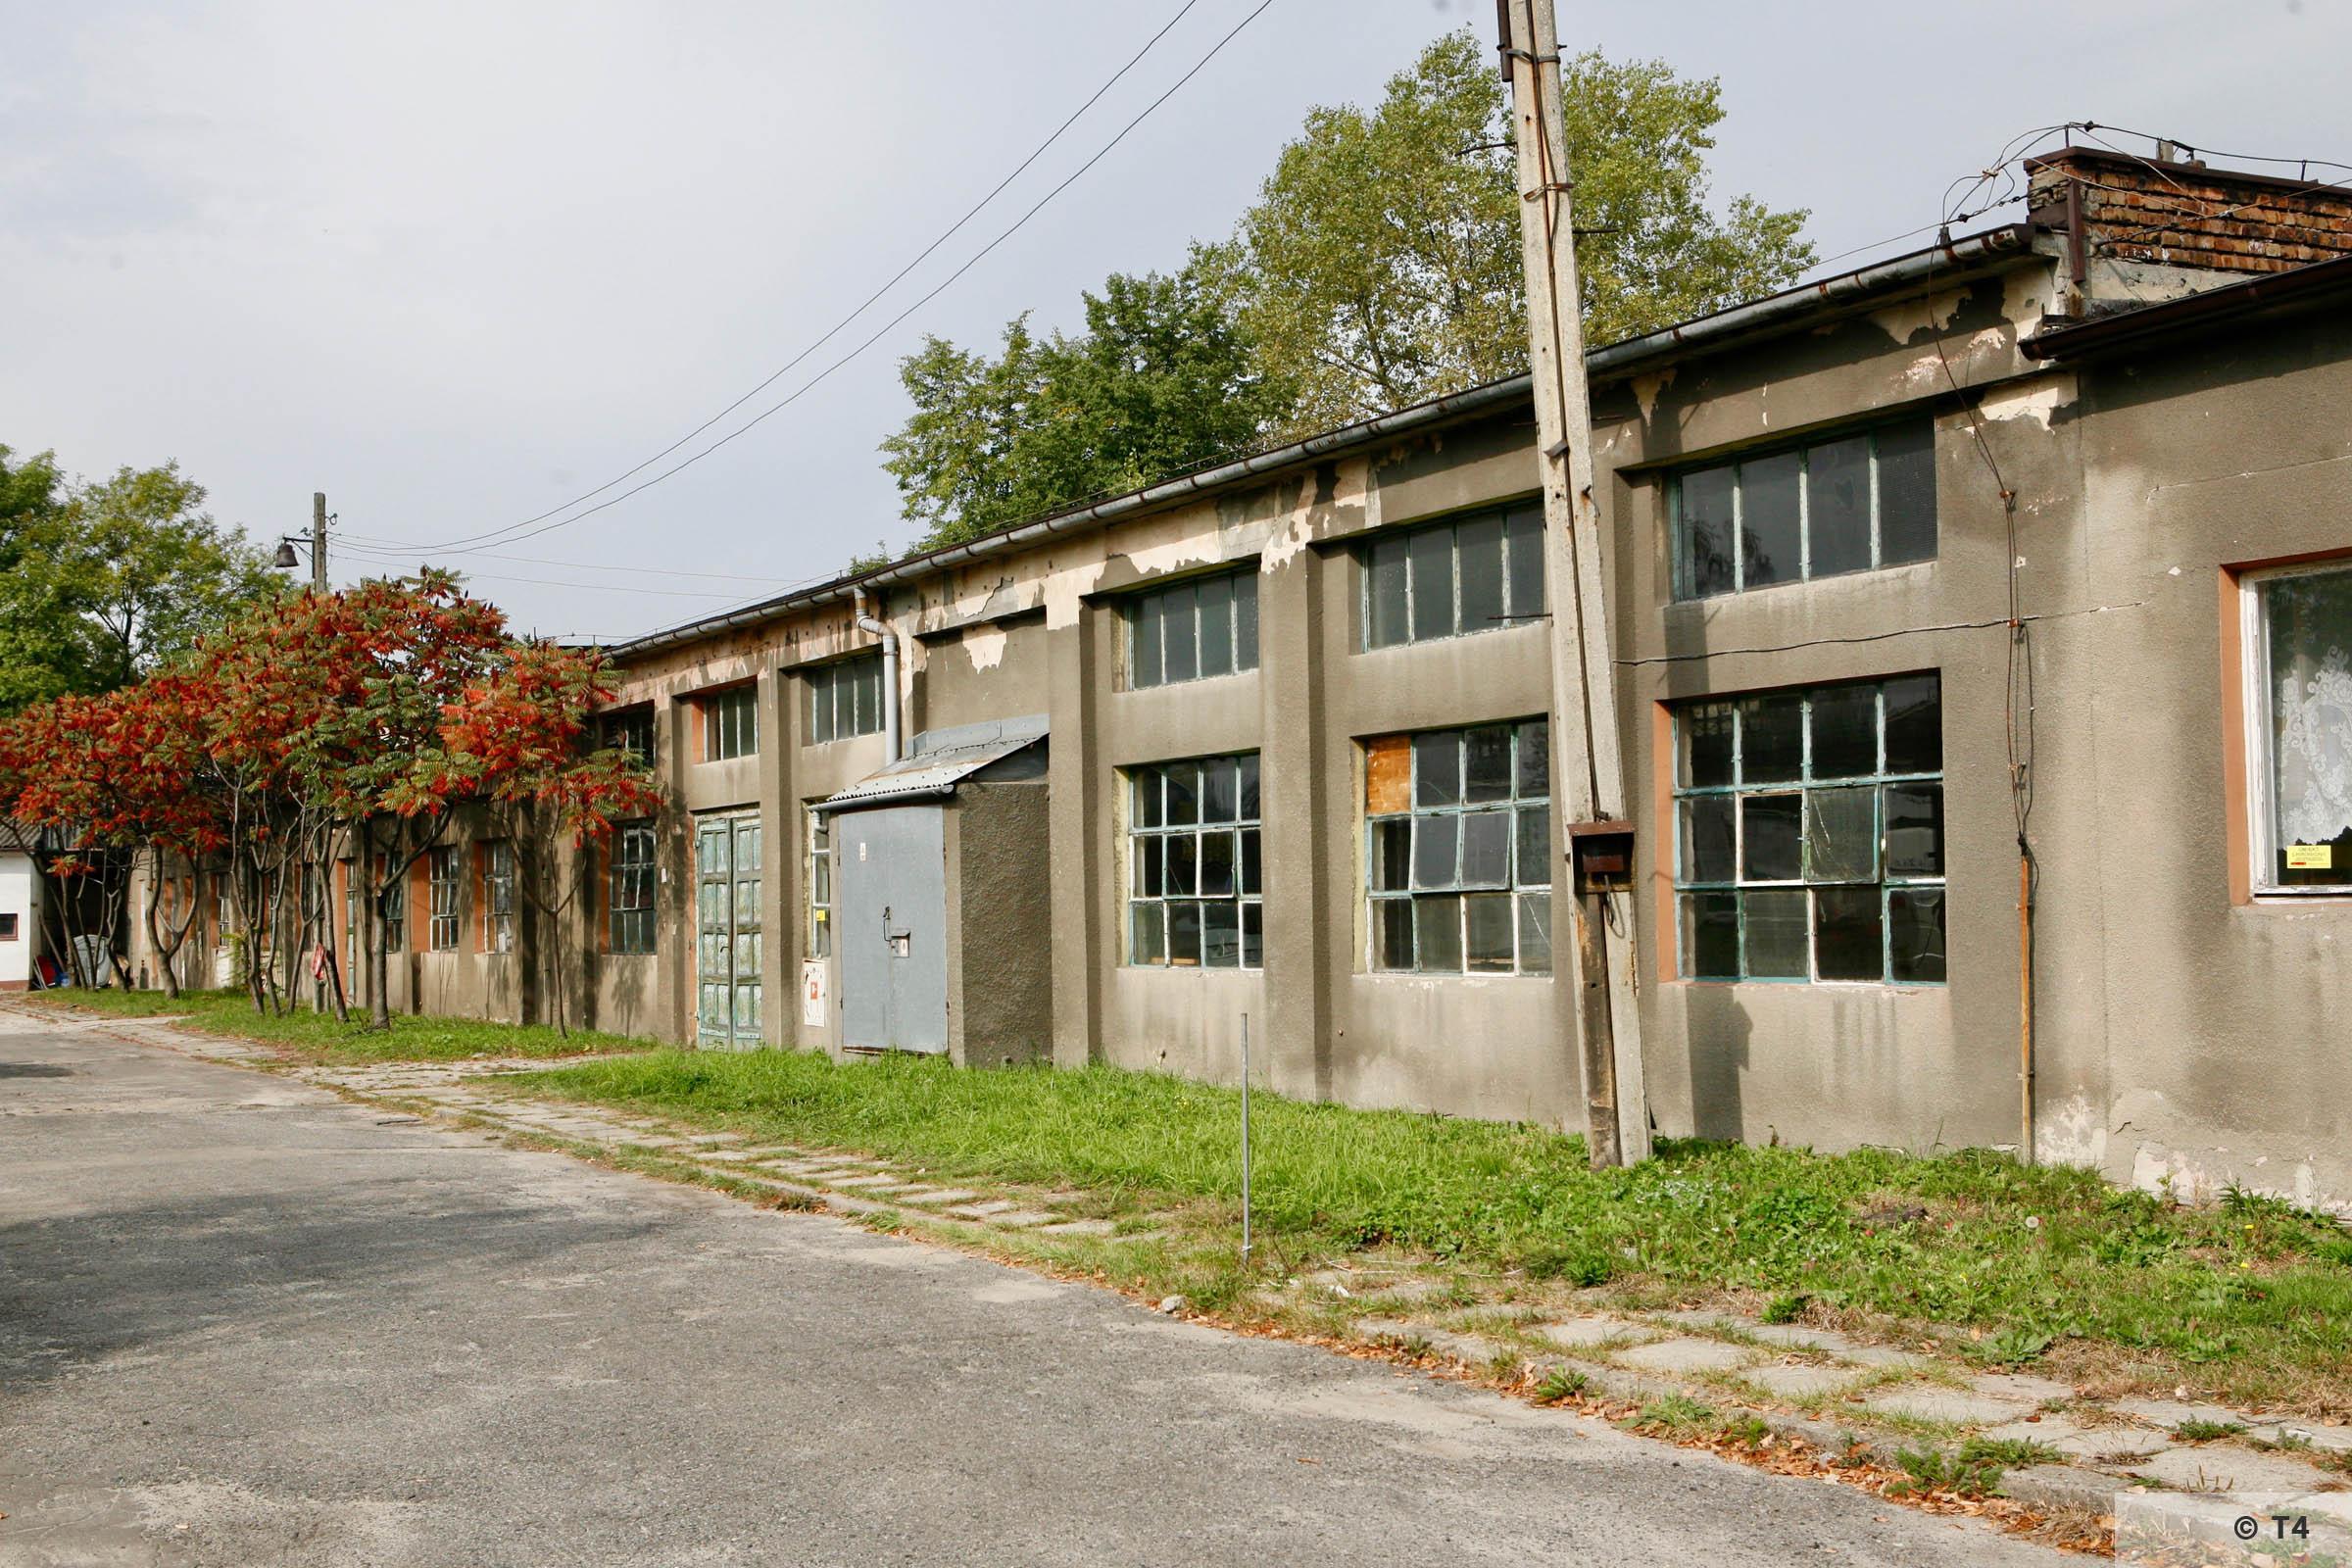 Former camp barrack next to the former Blockführerstube near the camp main entrance gate. T4 2788